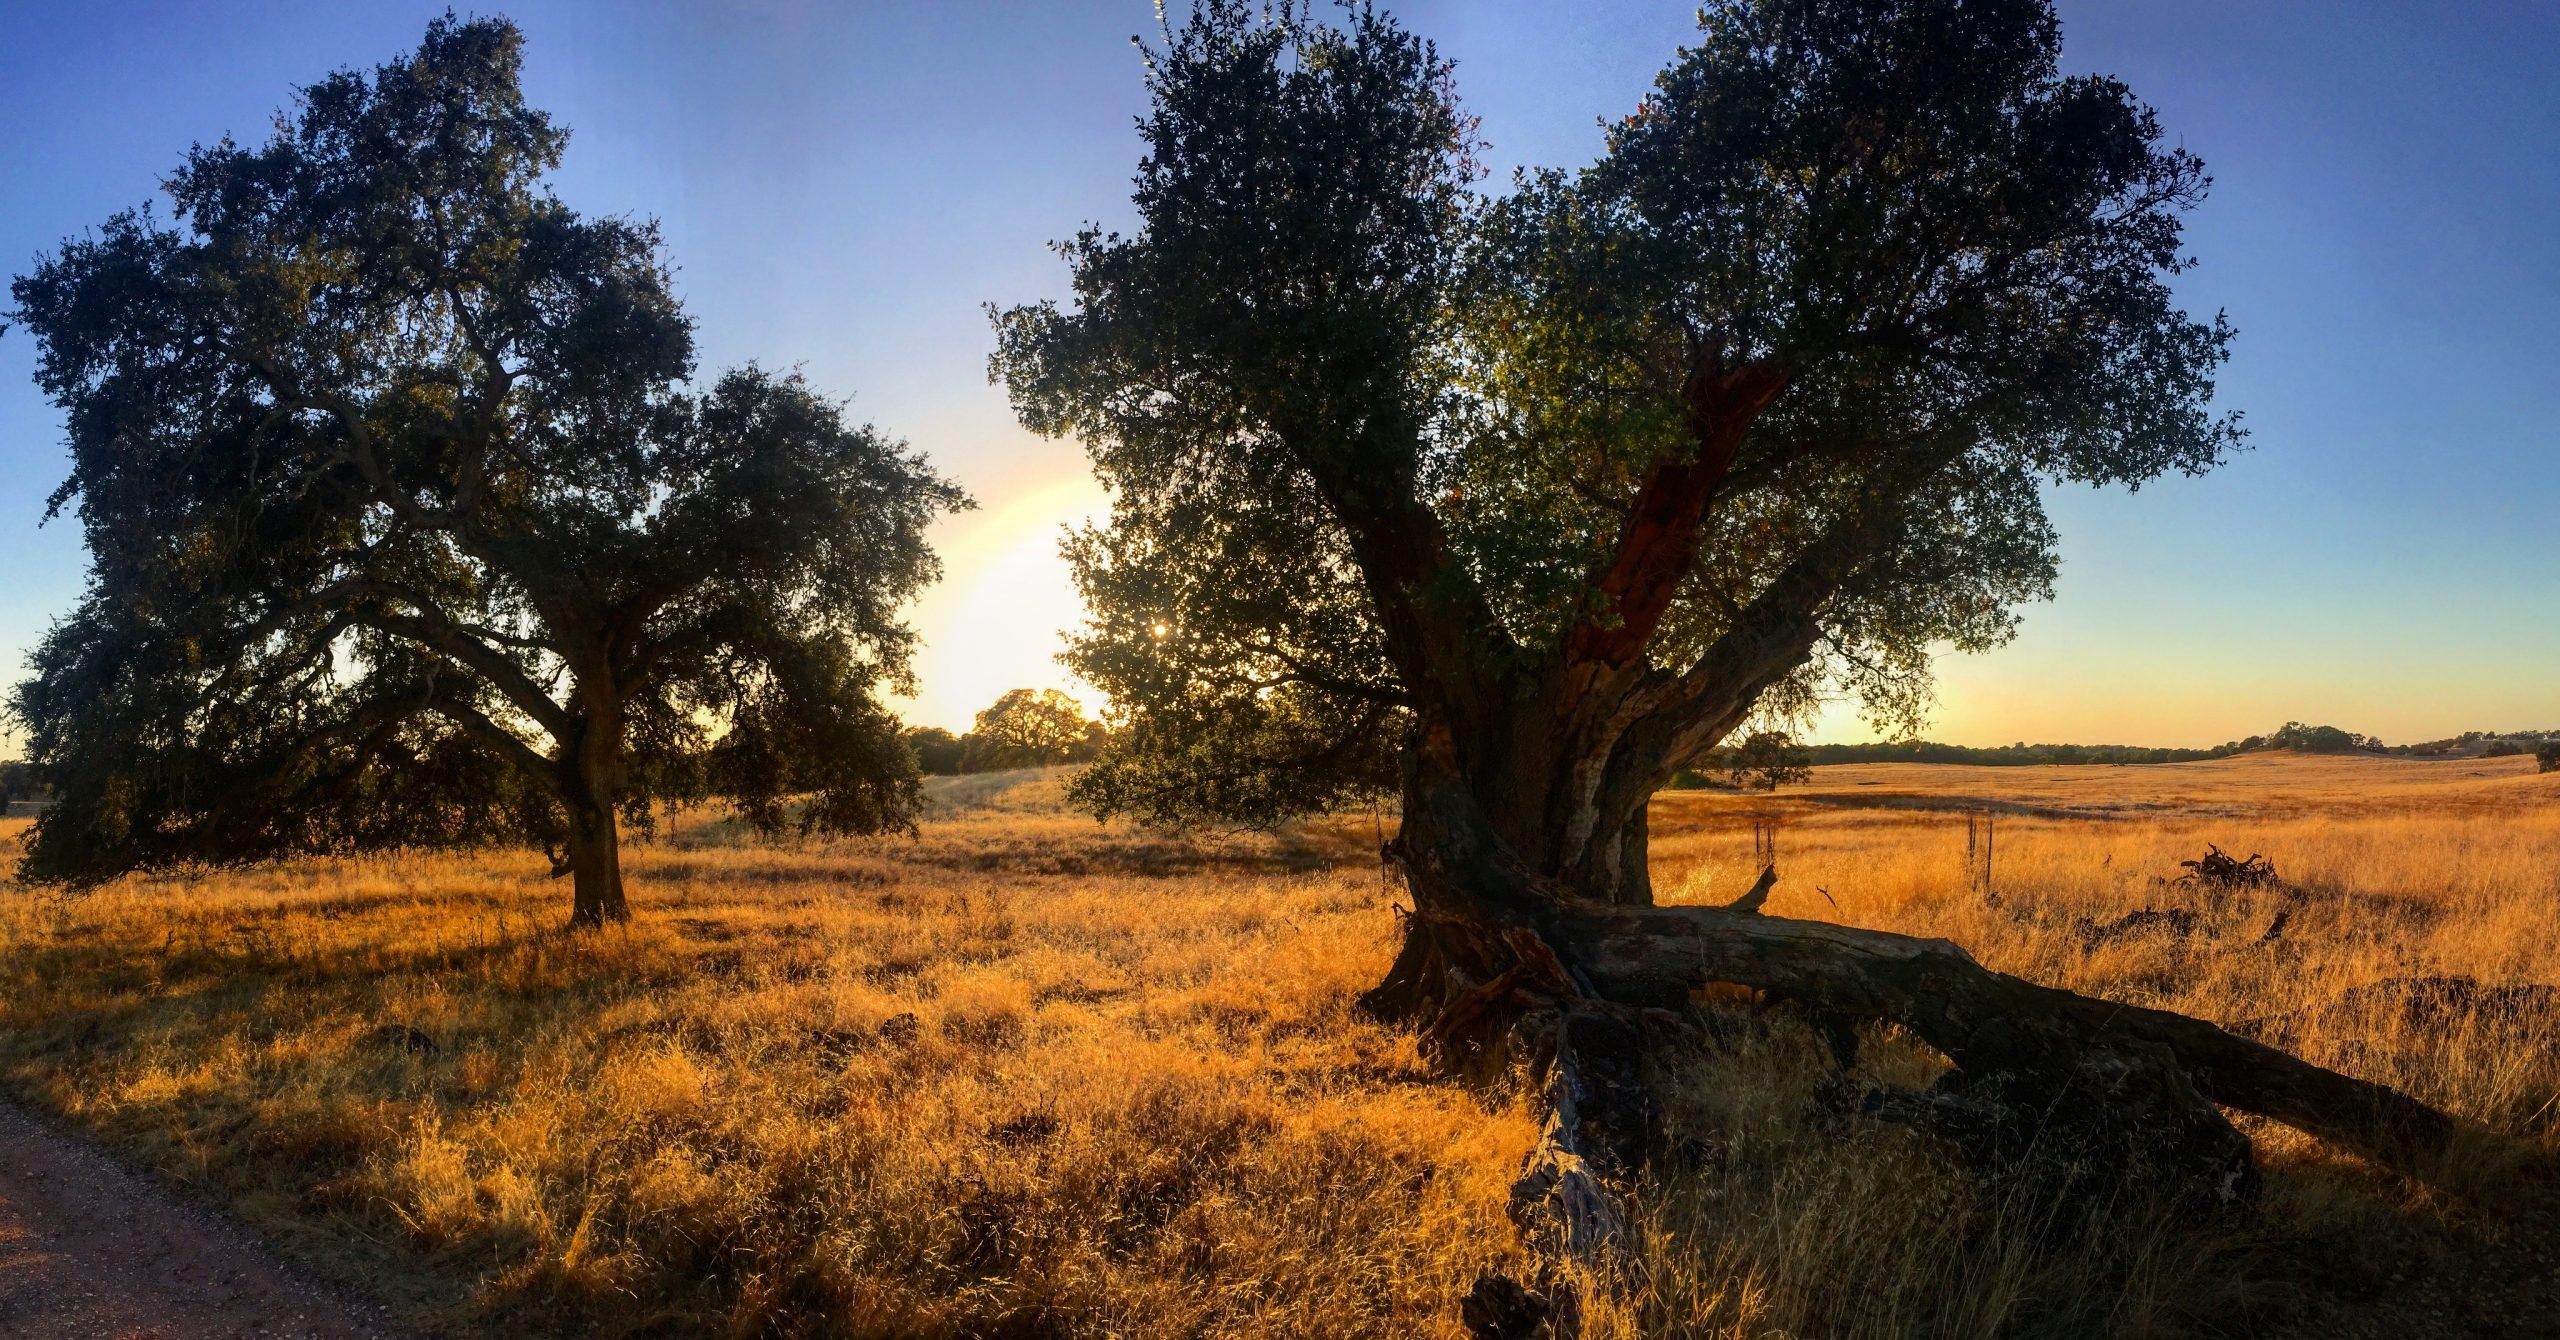 oak trees at sunset